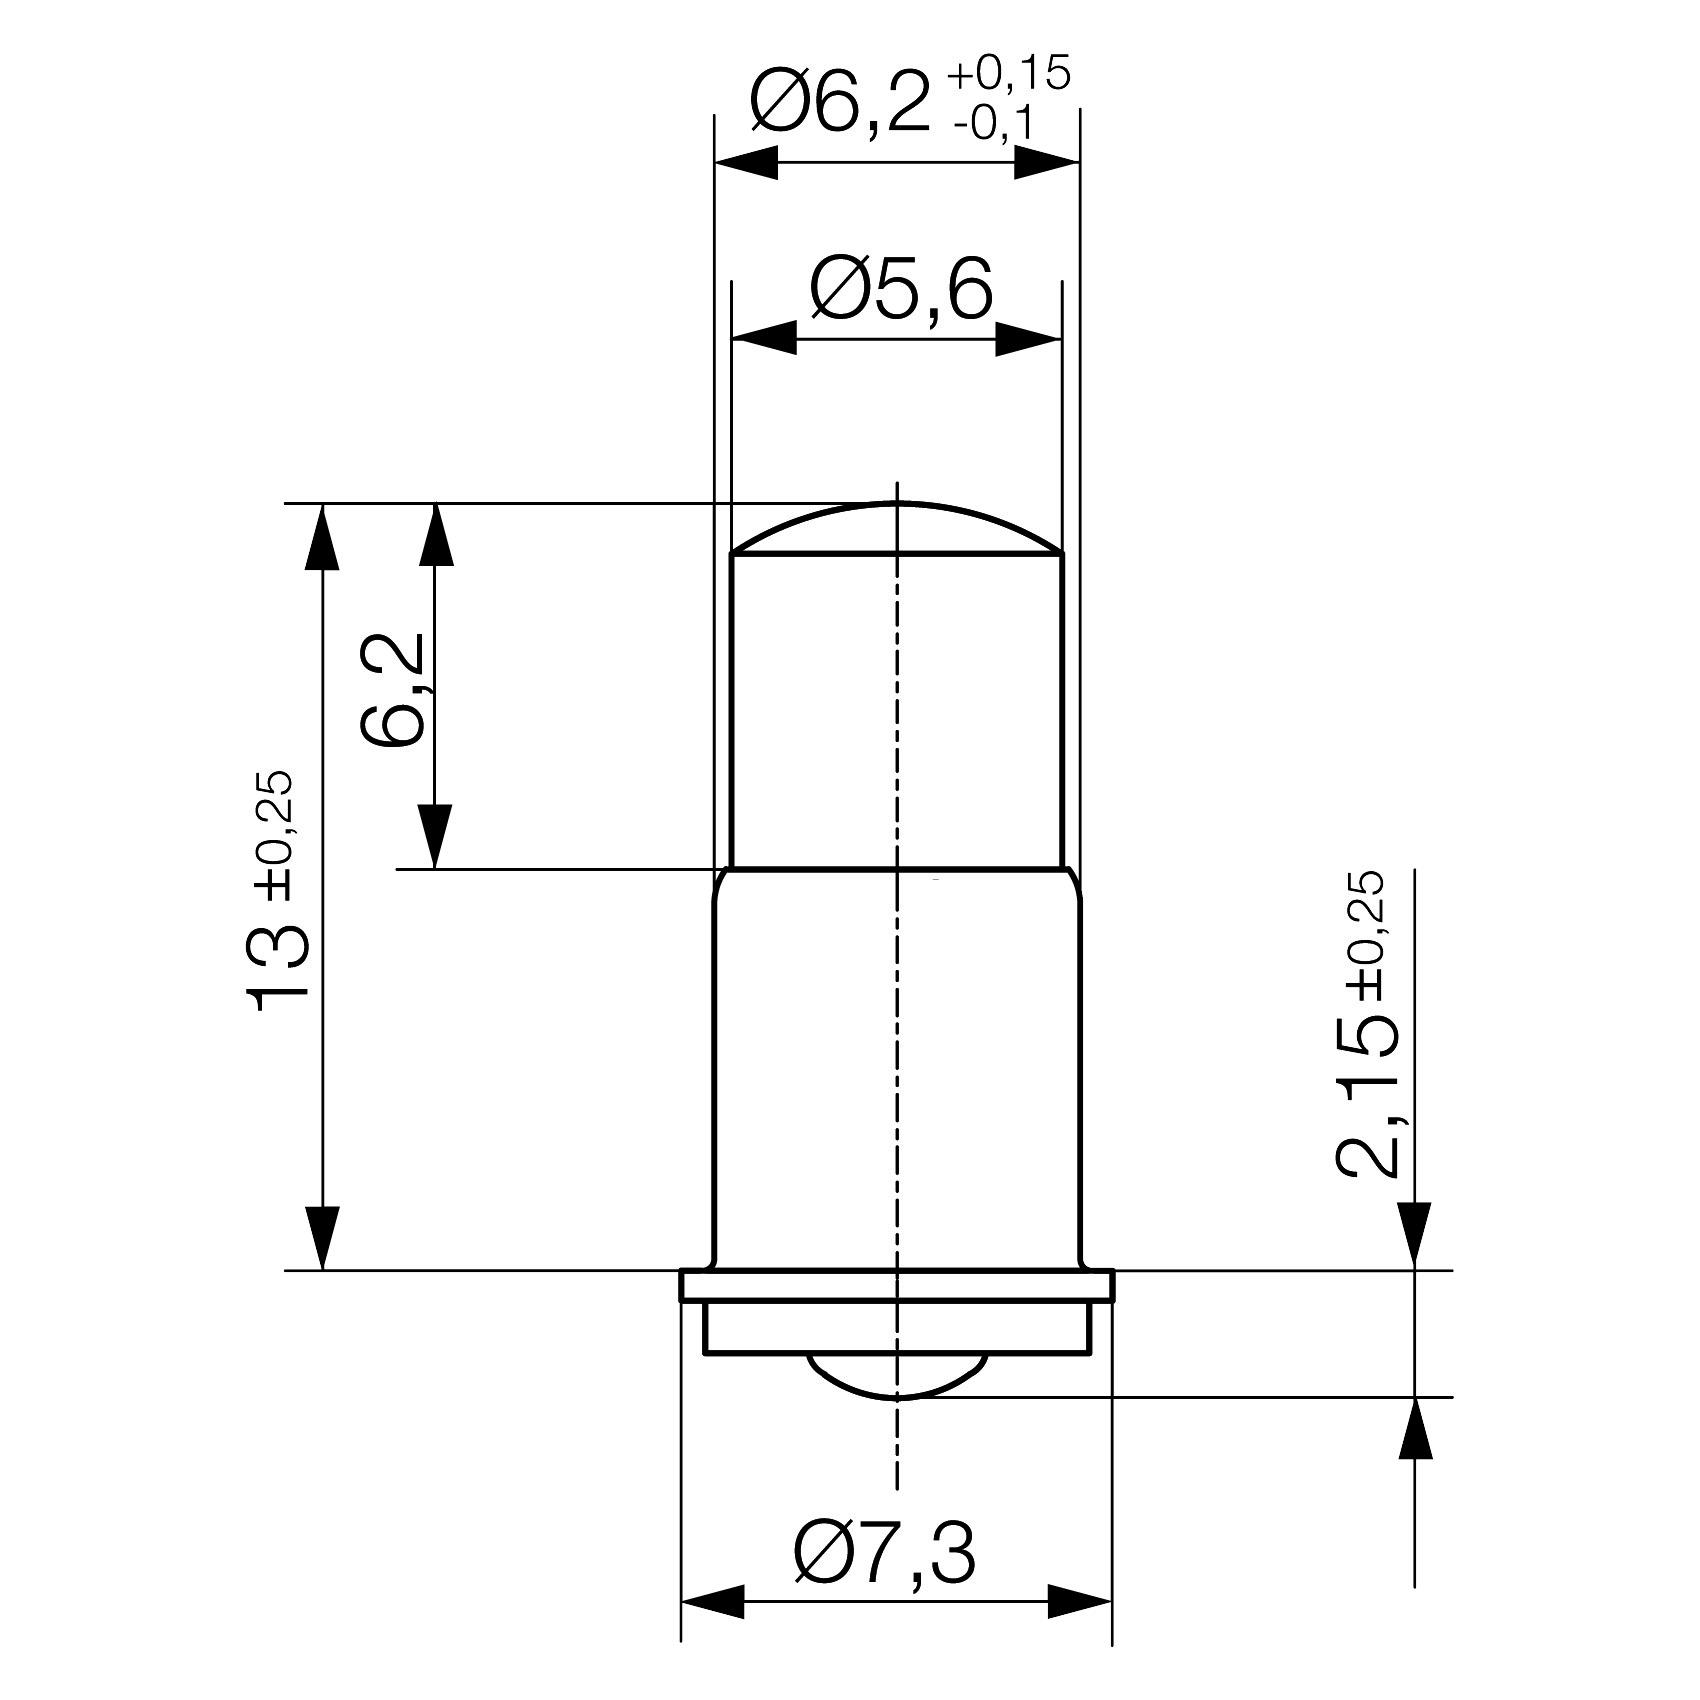 Multi-Look® LED lamp MF6s/8 - plan